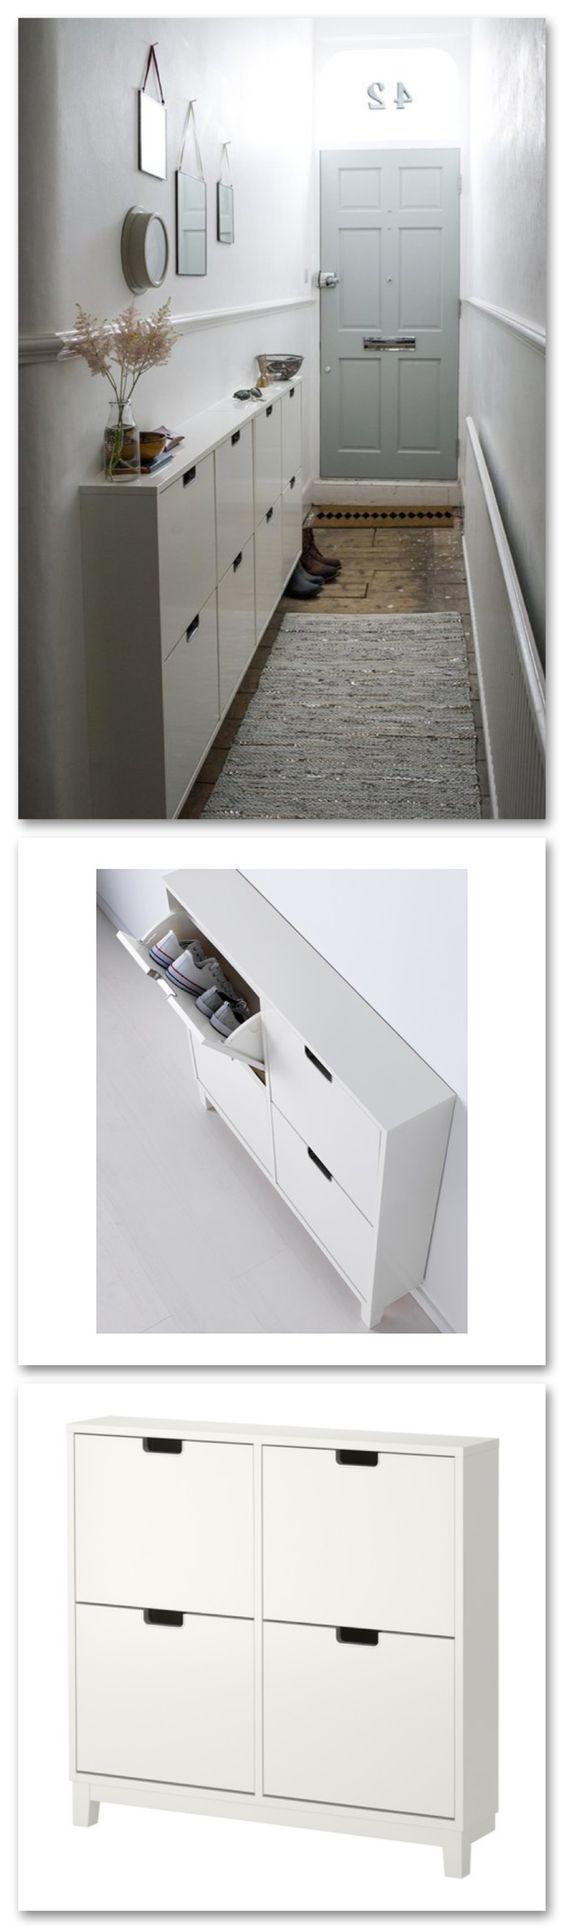 Schoenen Opbergkast Ikea.Kleine Schoenenkast Brazilinsight